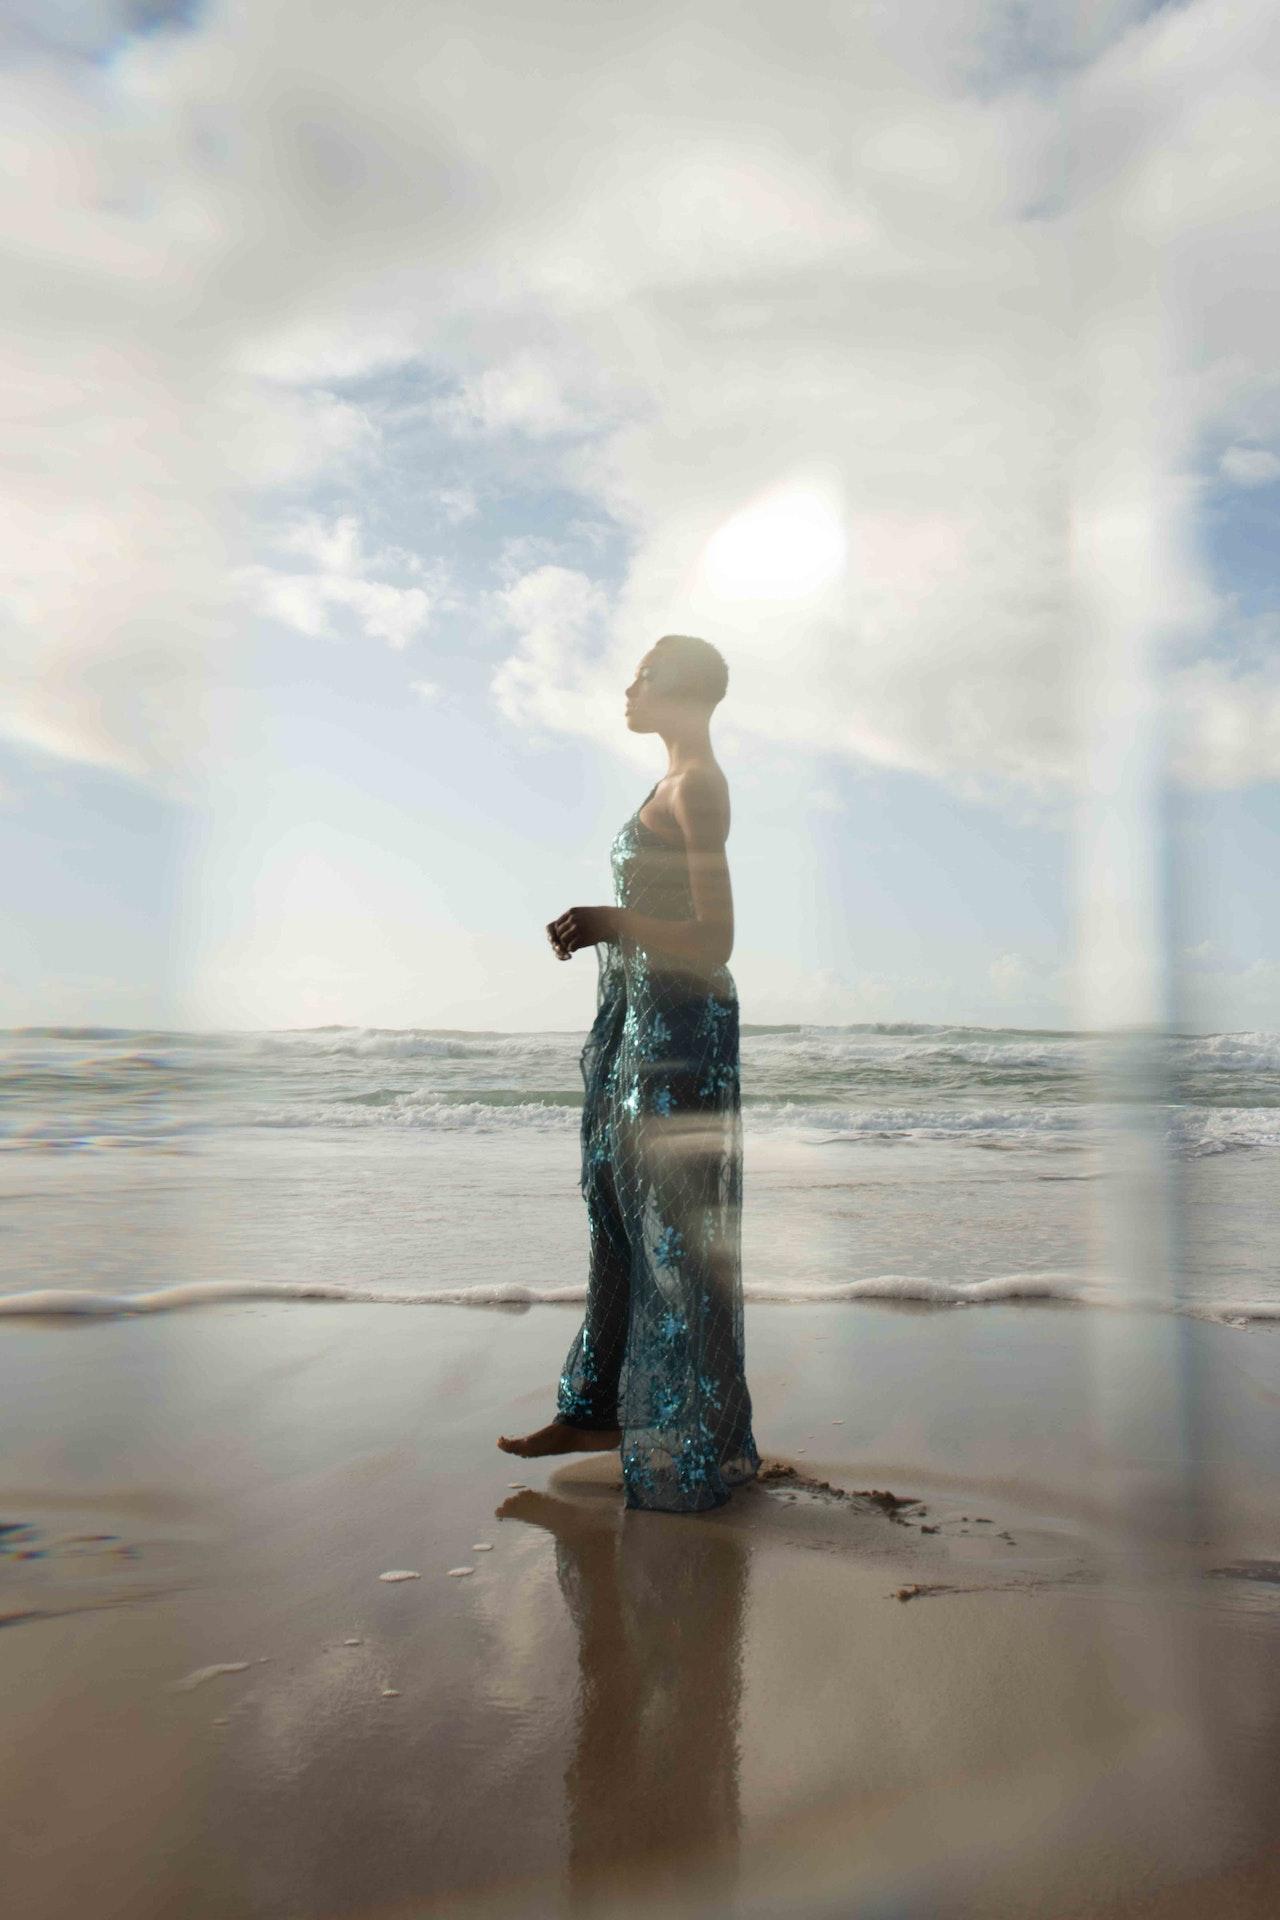 'NEAR THE OCEAN' - DRAFT MAG